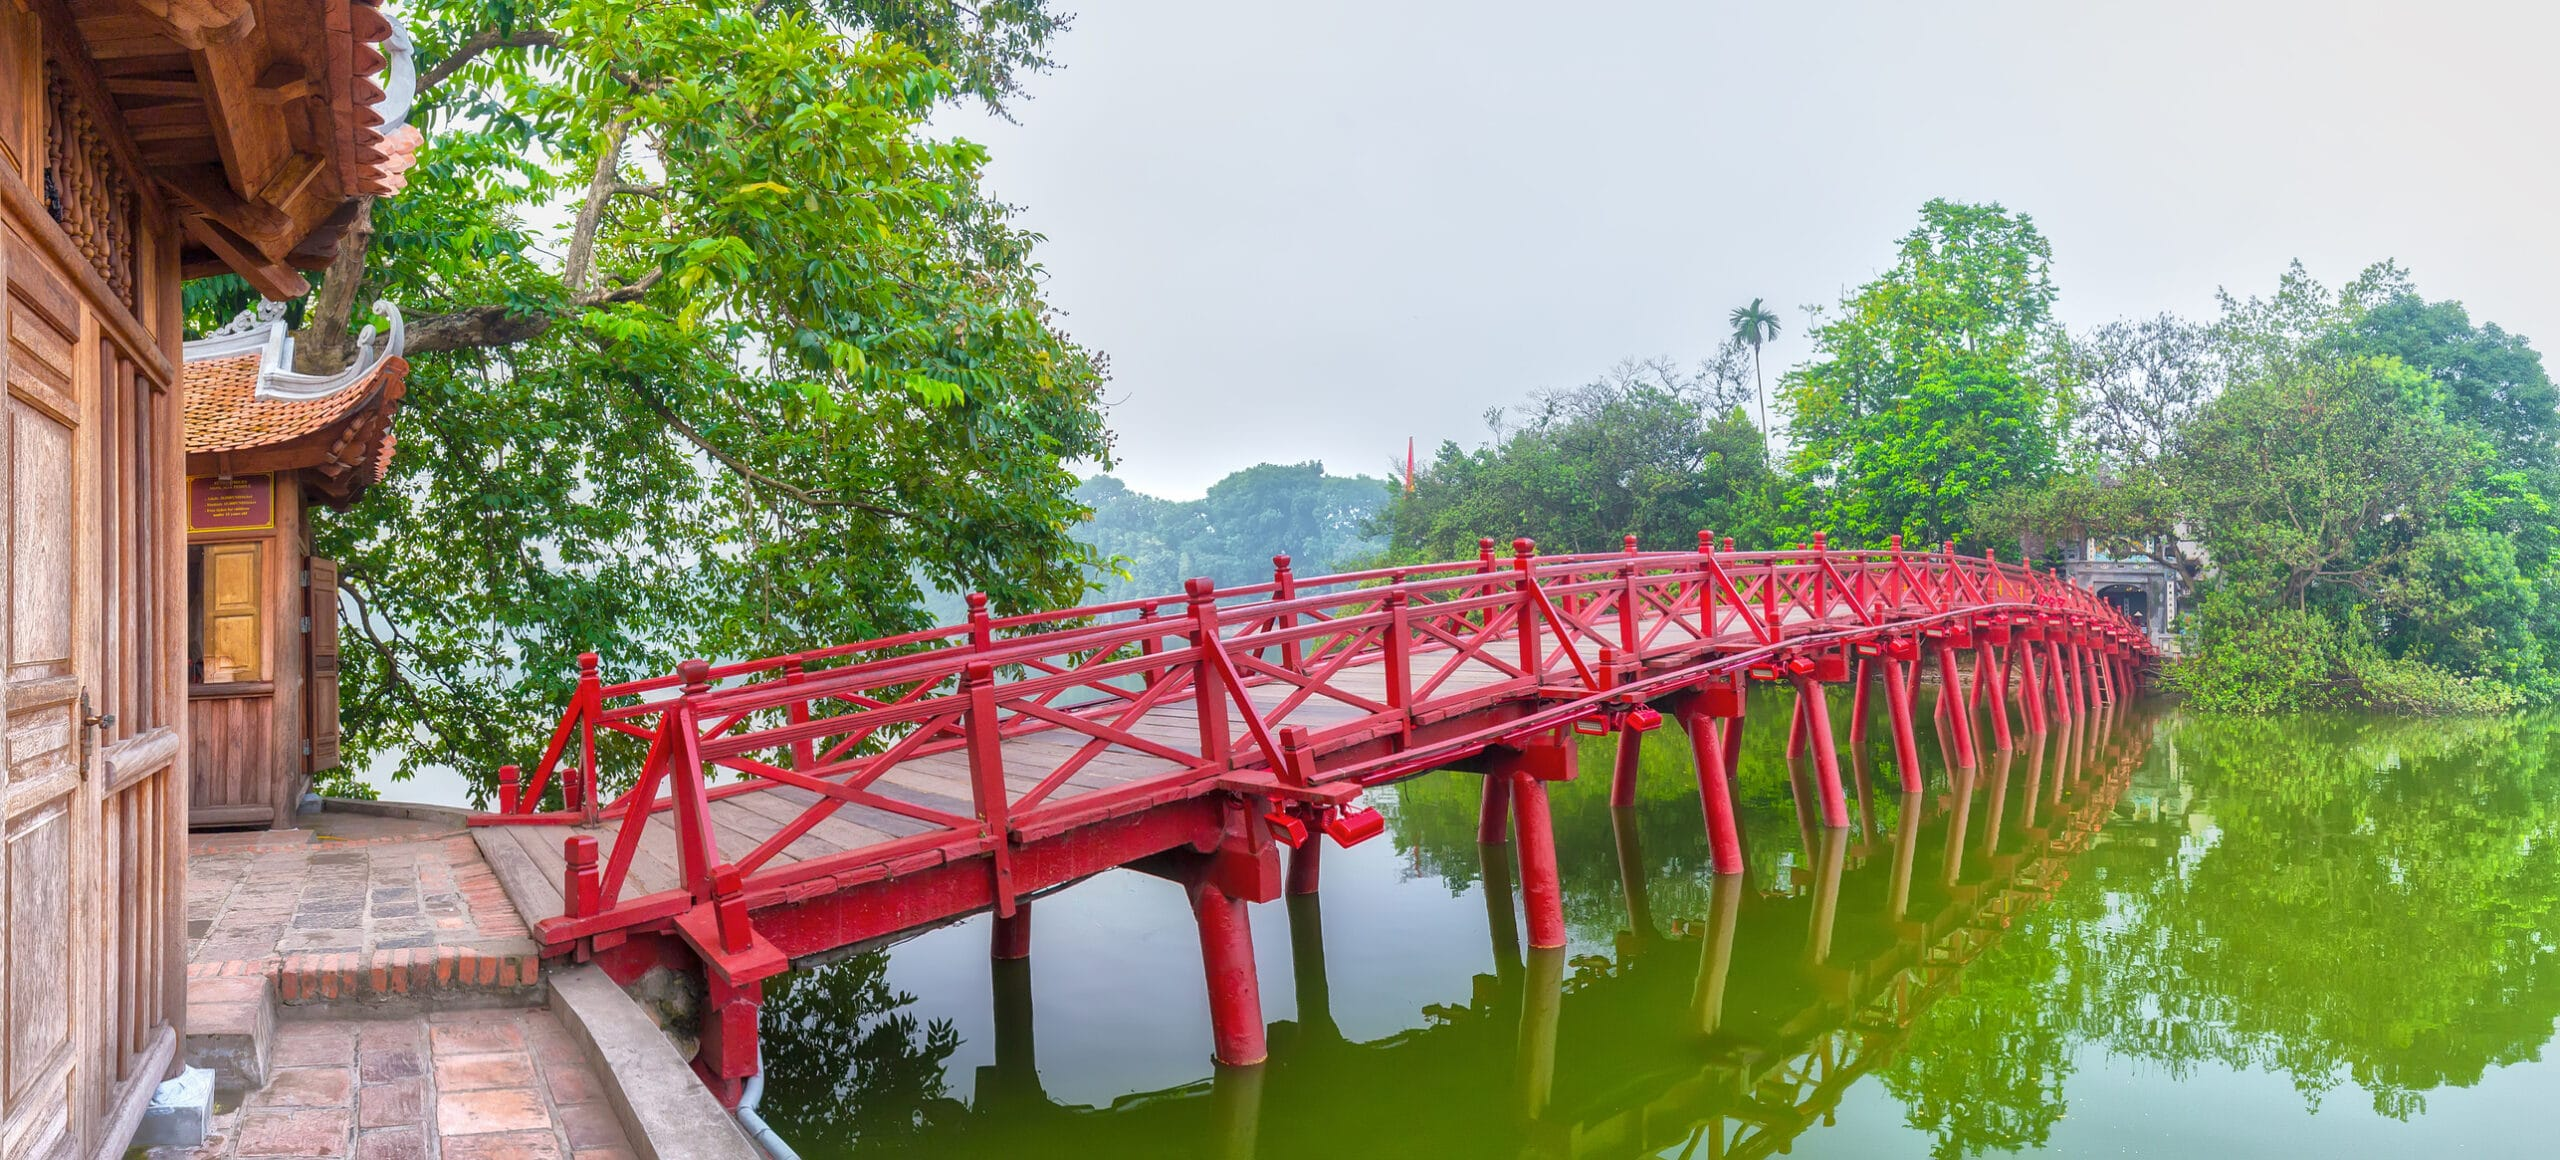 Huc Bridge spanning the Ngoc Son Temple, Hanoi, Vietnam with curved bridge architecture crawfish red symbolizes capital region thousands of years civilization, god temple tortoises enters Vietnam history